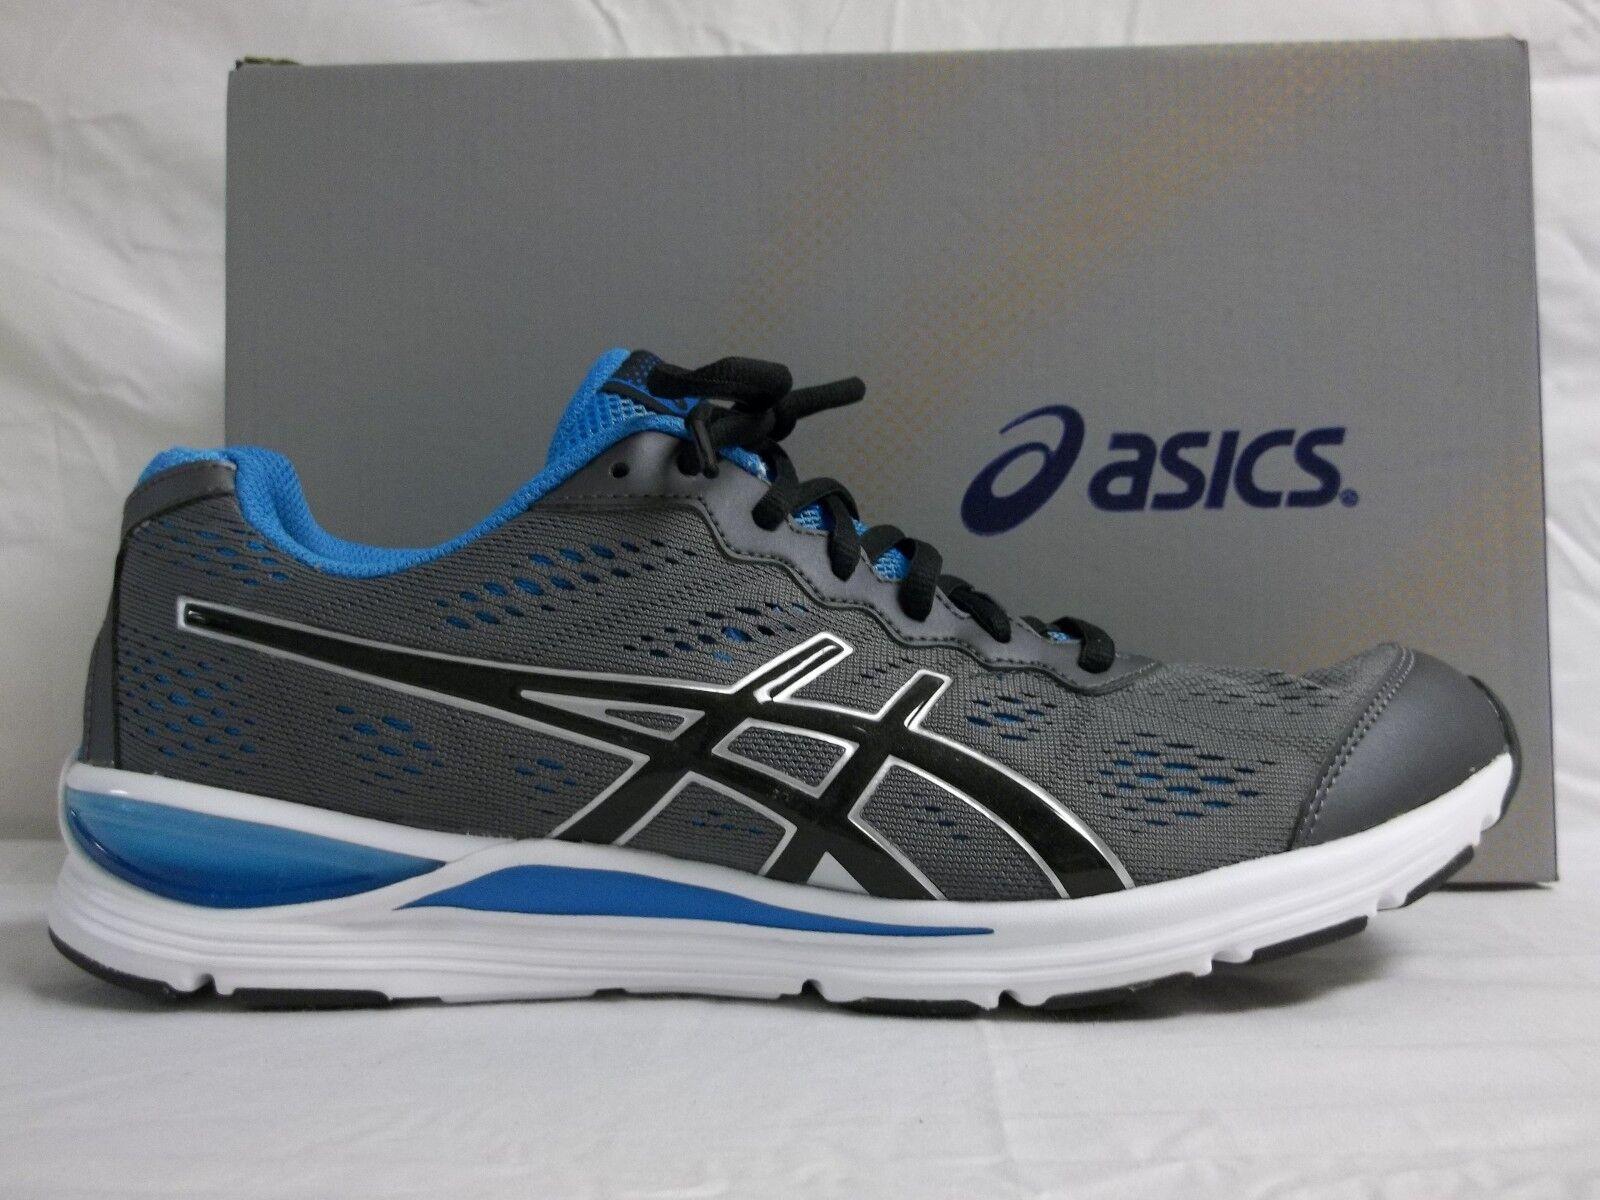 Asics Size 11.5 M GEL STORM 2 Granite Black Athletic Sneakers New Mens shoes